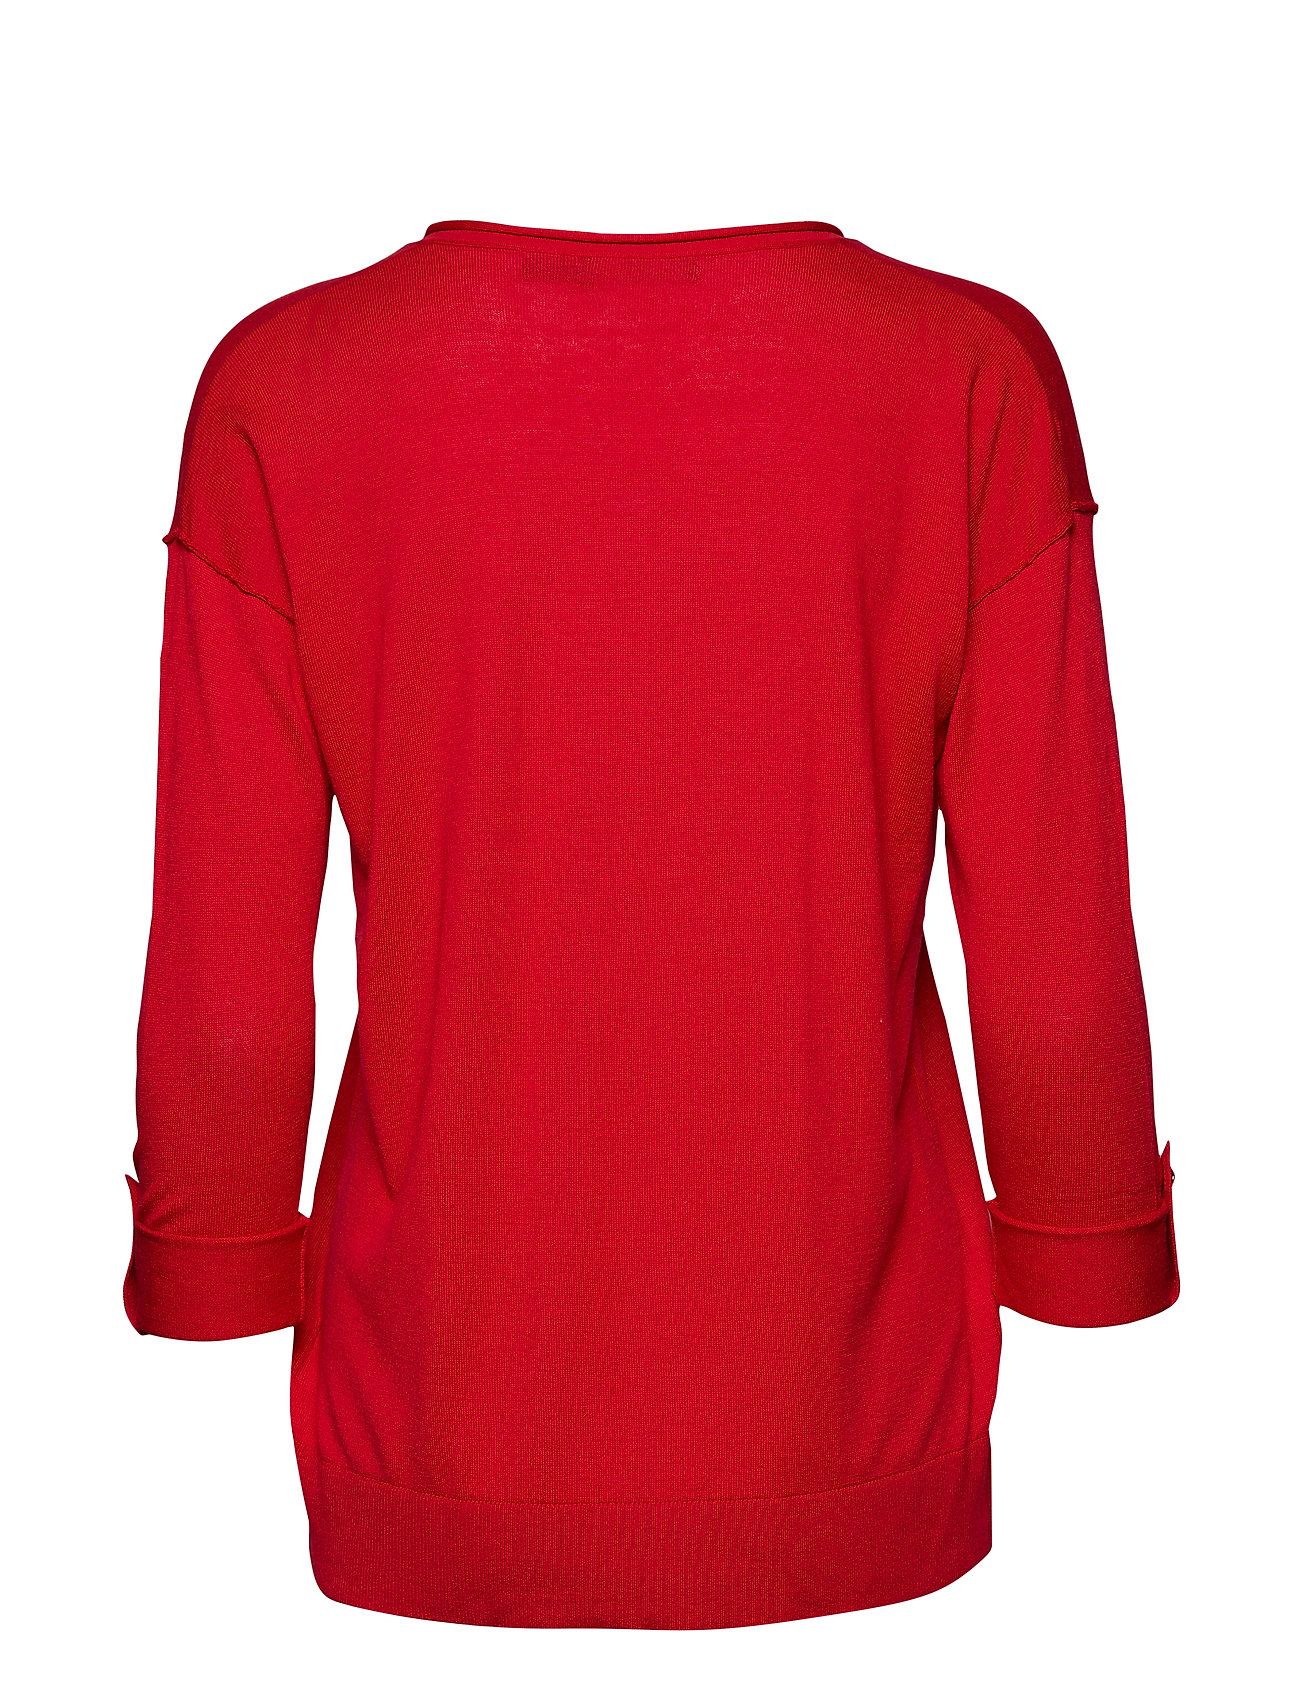 Silk Sweaterlipstick sleeve Tab Ralph RedLauren blend BxrWdCoQe